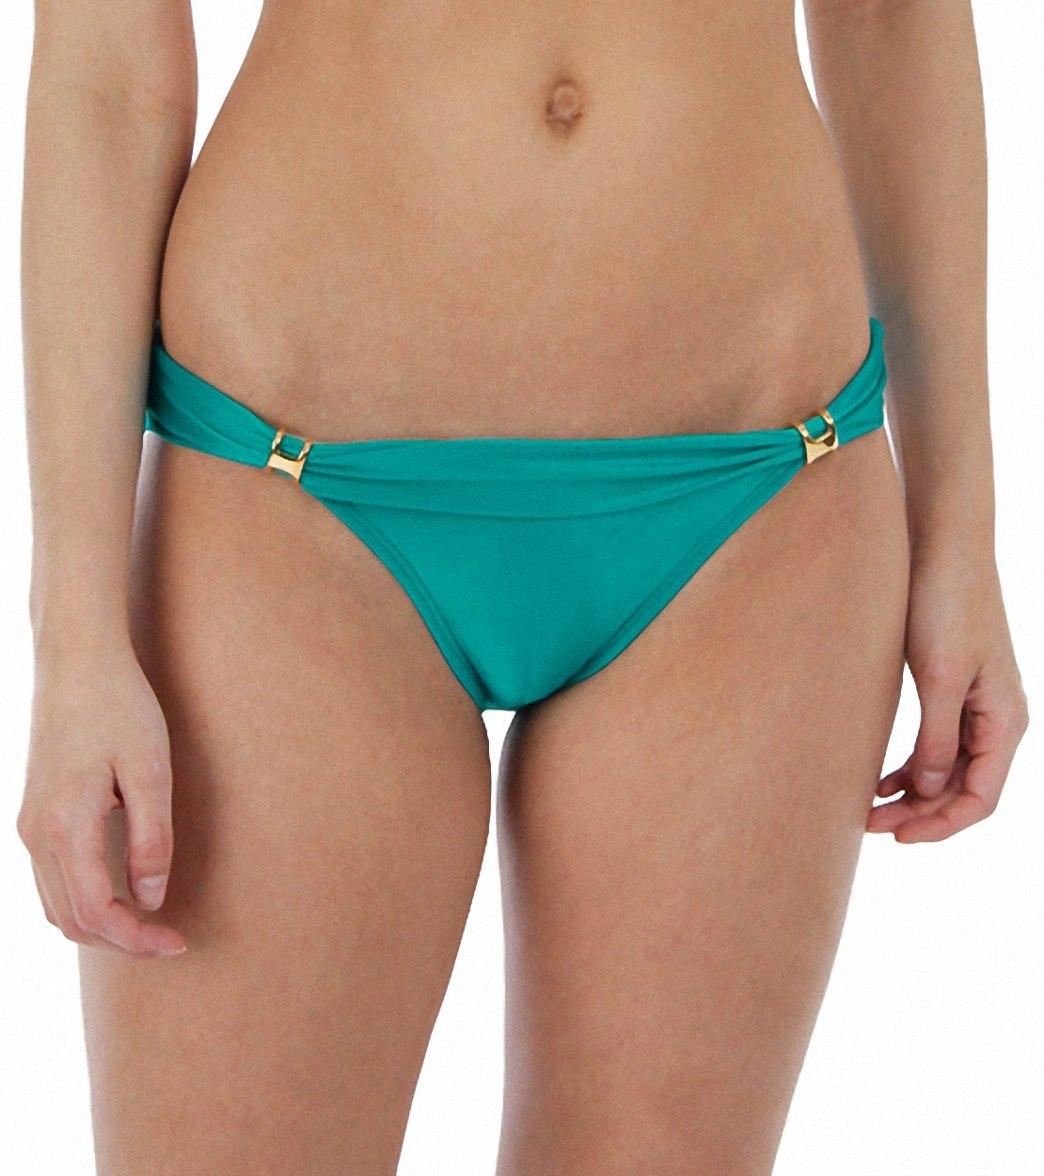 8ae328297 Vix Solid Turquoise Cozumel Tube Bikini Bottom at SwimOutlet.com ...